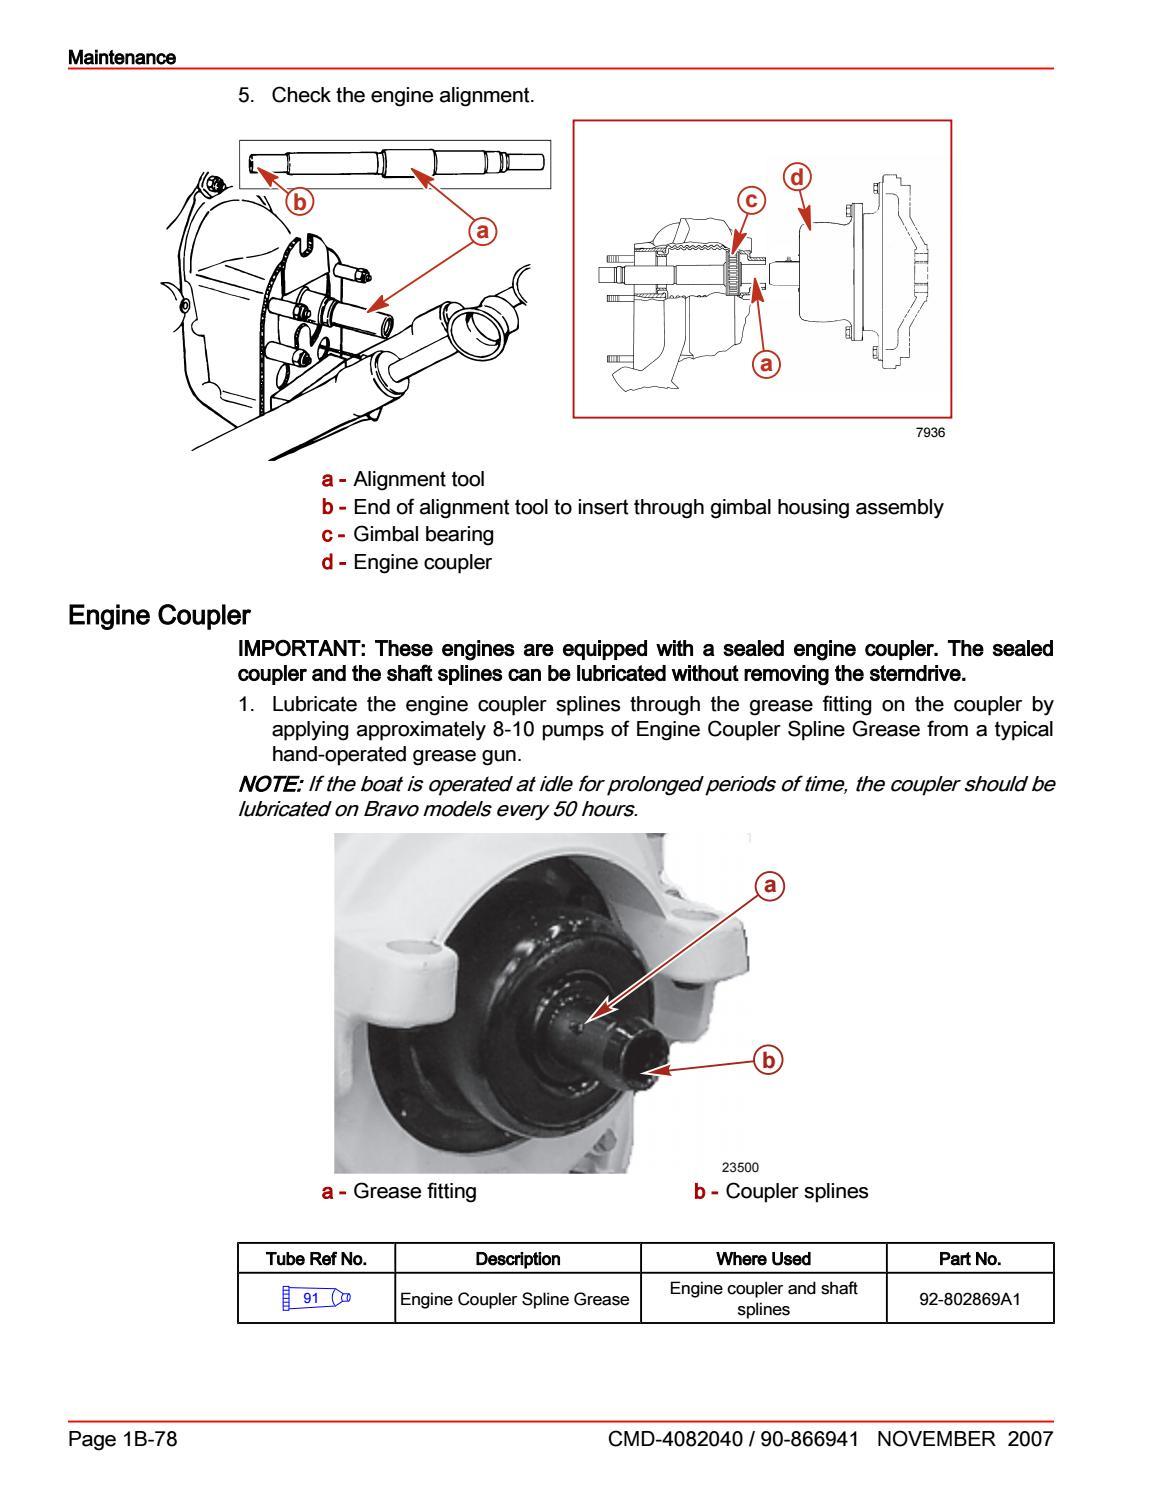 hight resolution of cummins mercruiser qsd 4 2 350 hp diesel engine service repair manual sn 88401000 and above